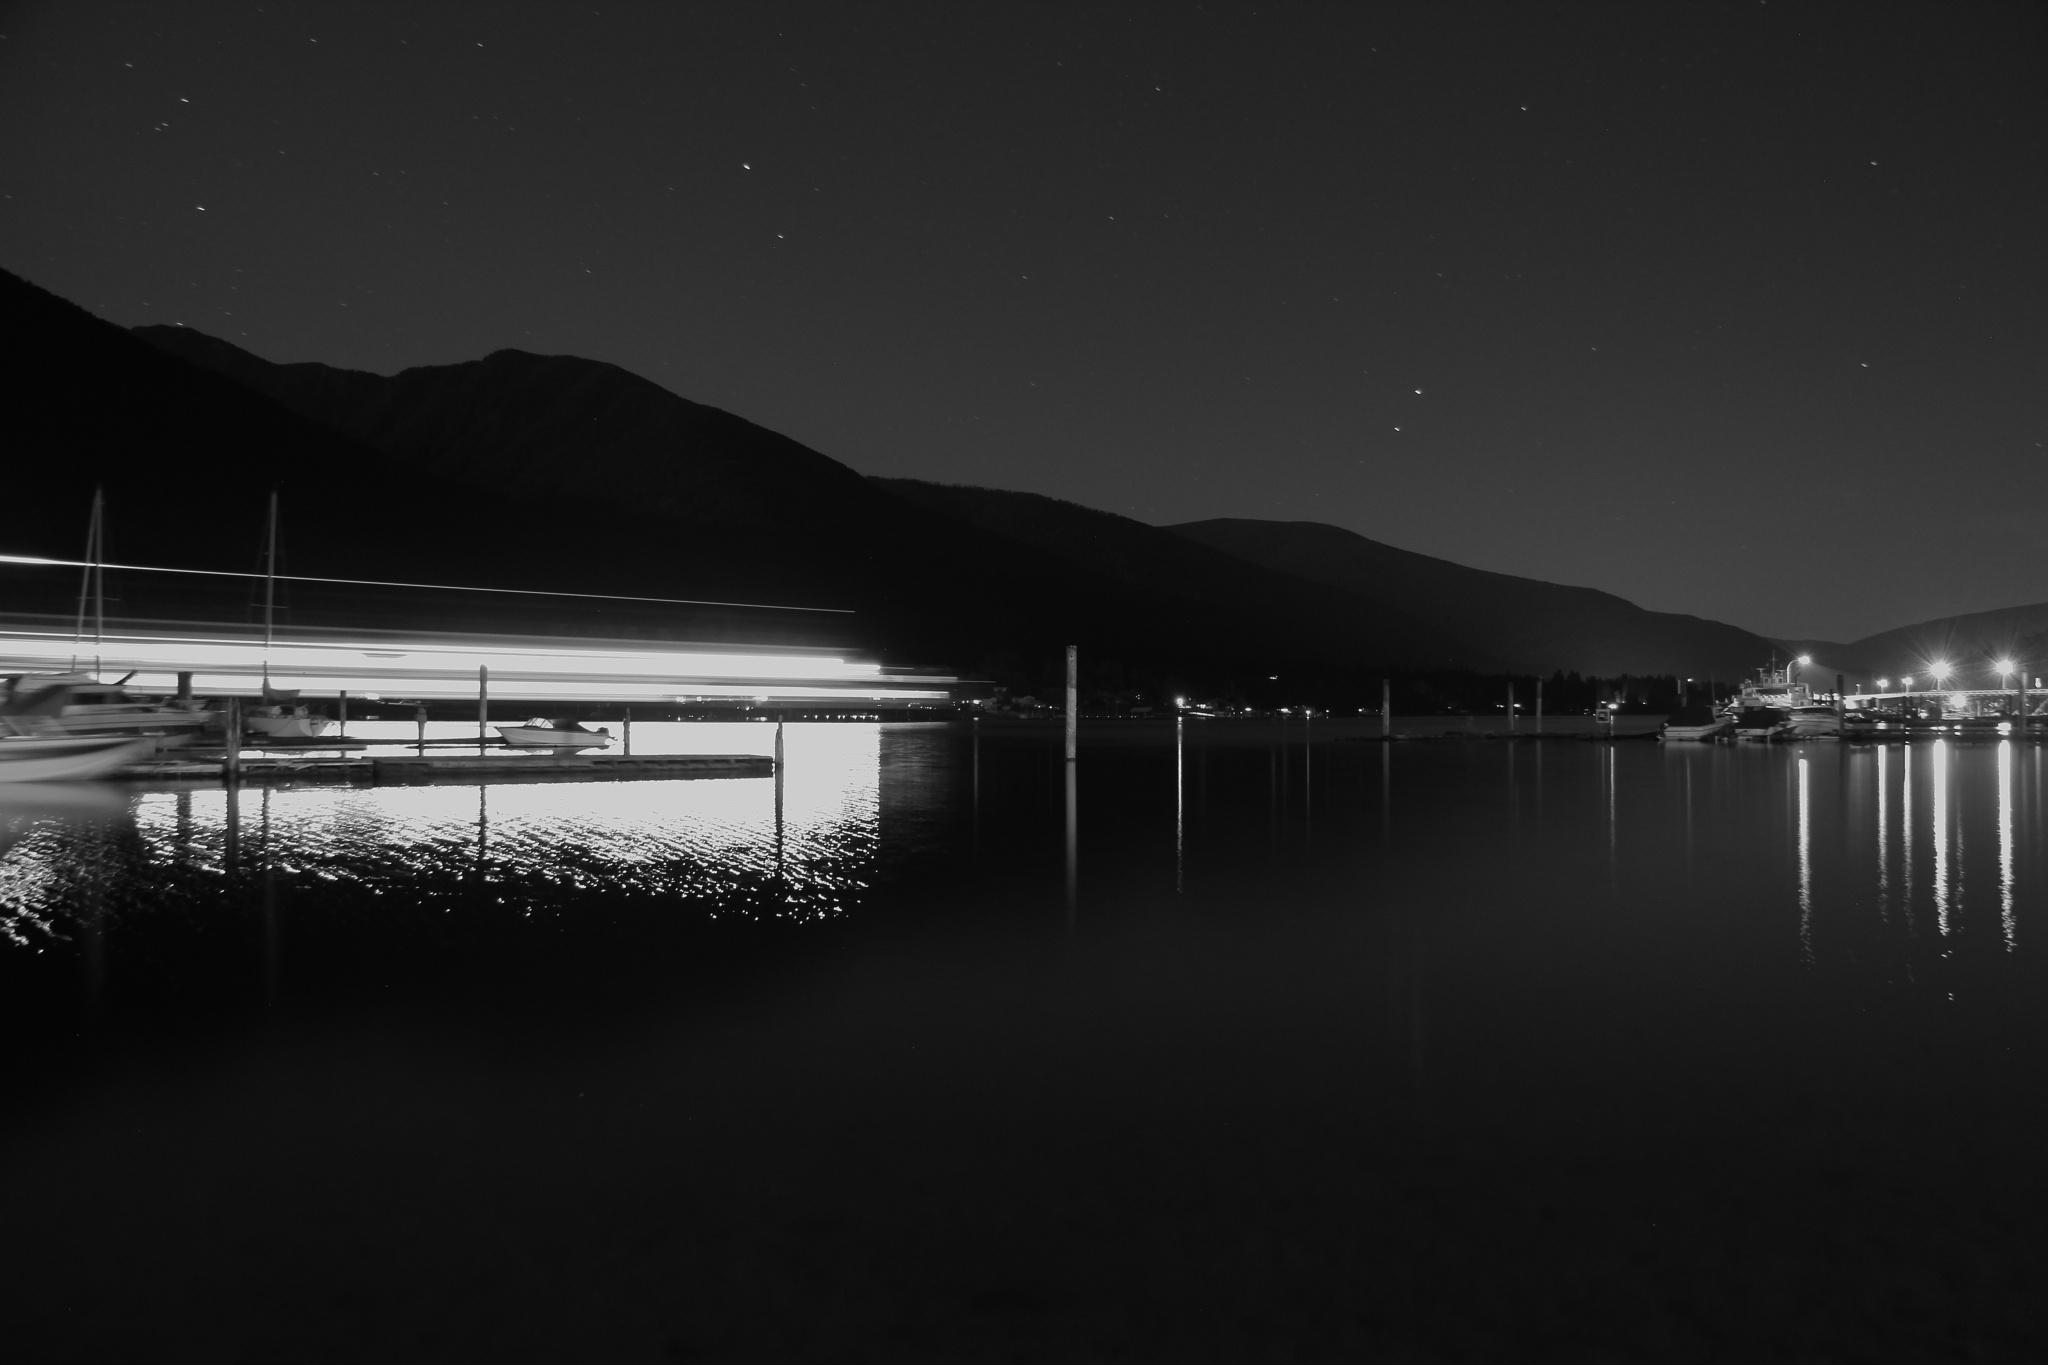 Ferry Lights by Shaun Ashmead